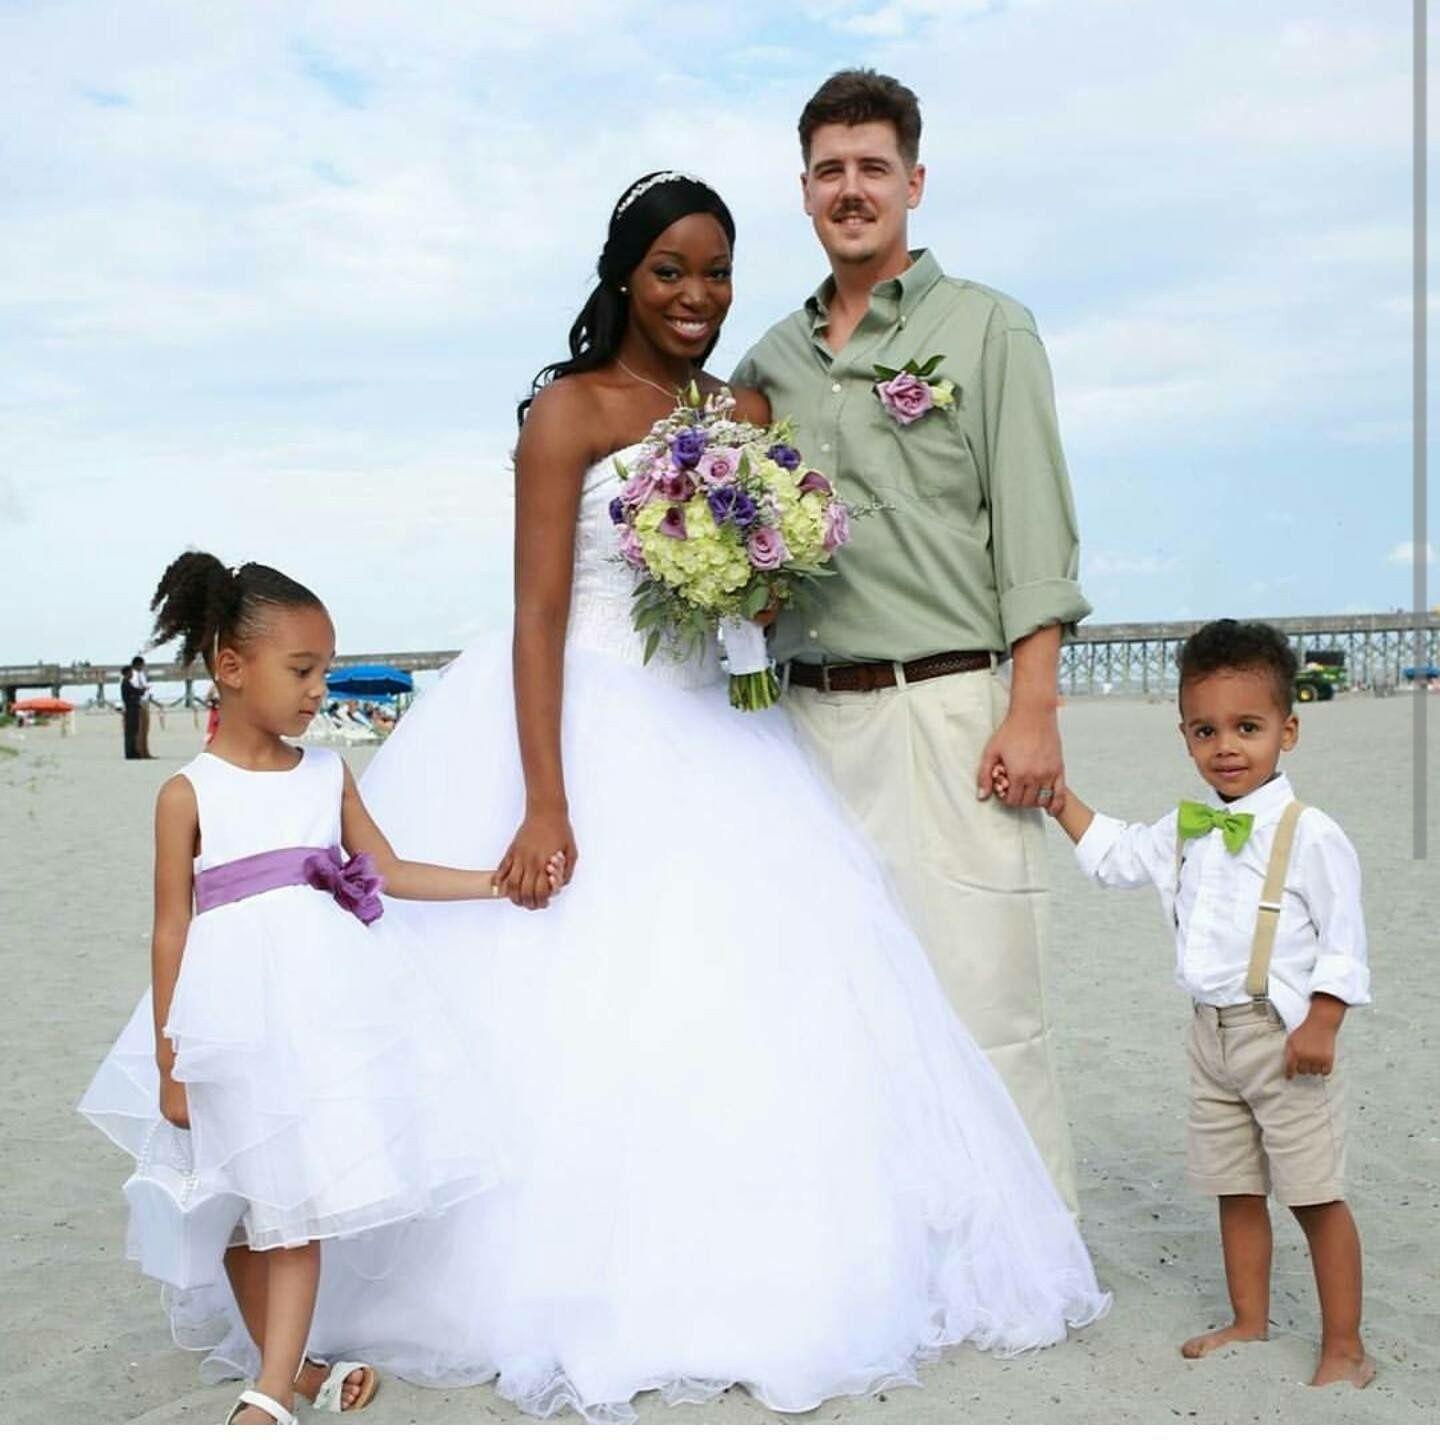 Family is God's masterpiece! love this one#family #Godsmasterpiece #interracialmarriage #love #beautiful #BWWM #WMBW #swirllife #fashionistas #stylishbunch #perfectblend #photography #Beachshot #Teamswirl #Swirling #Loveconquersall #Newlyweds #Beachwedding #Bridalgown #Bouquet #fashion #style